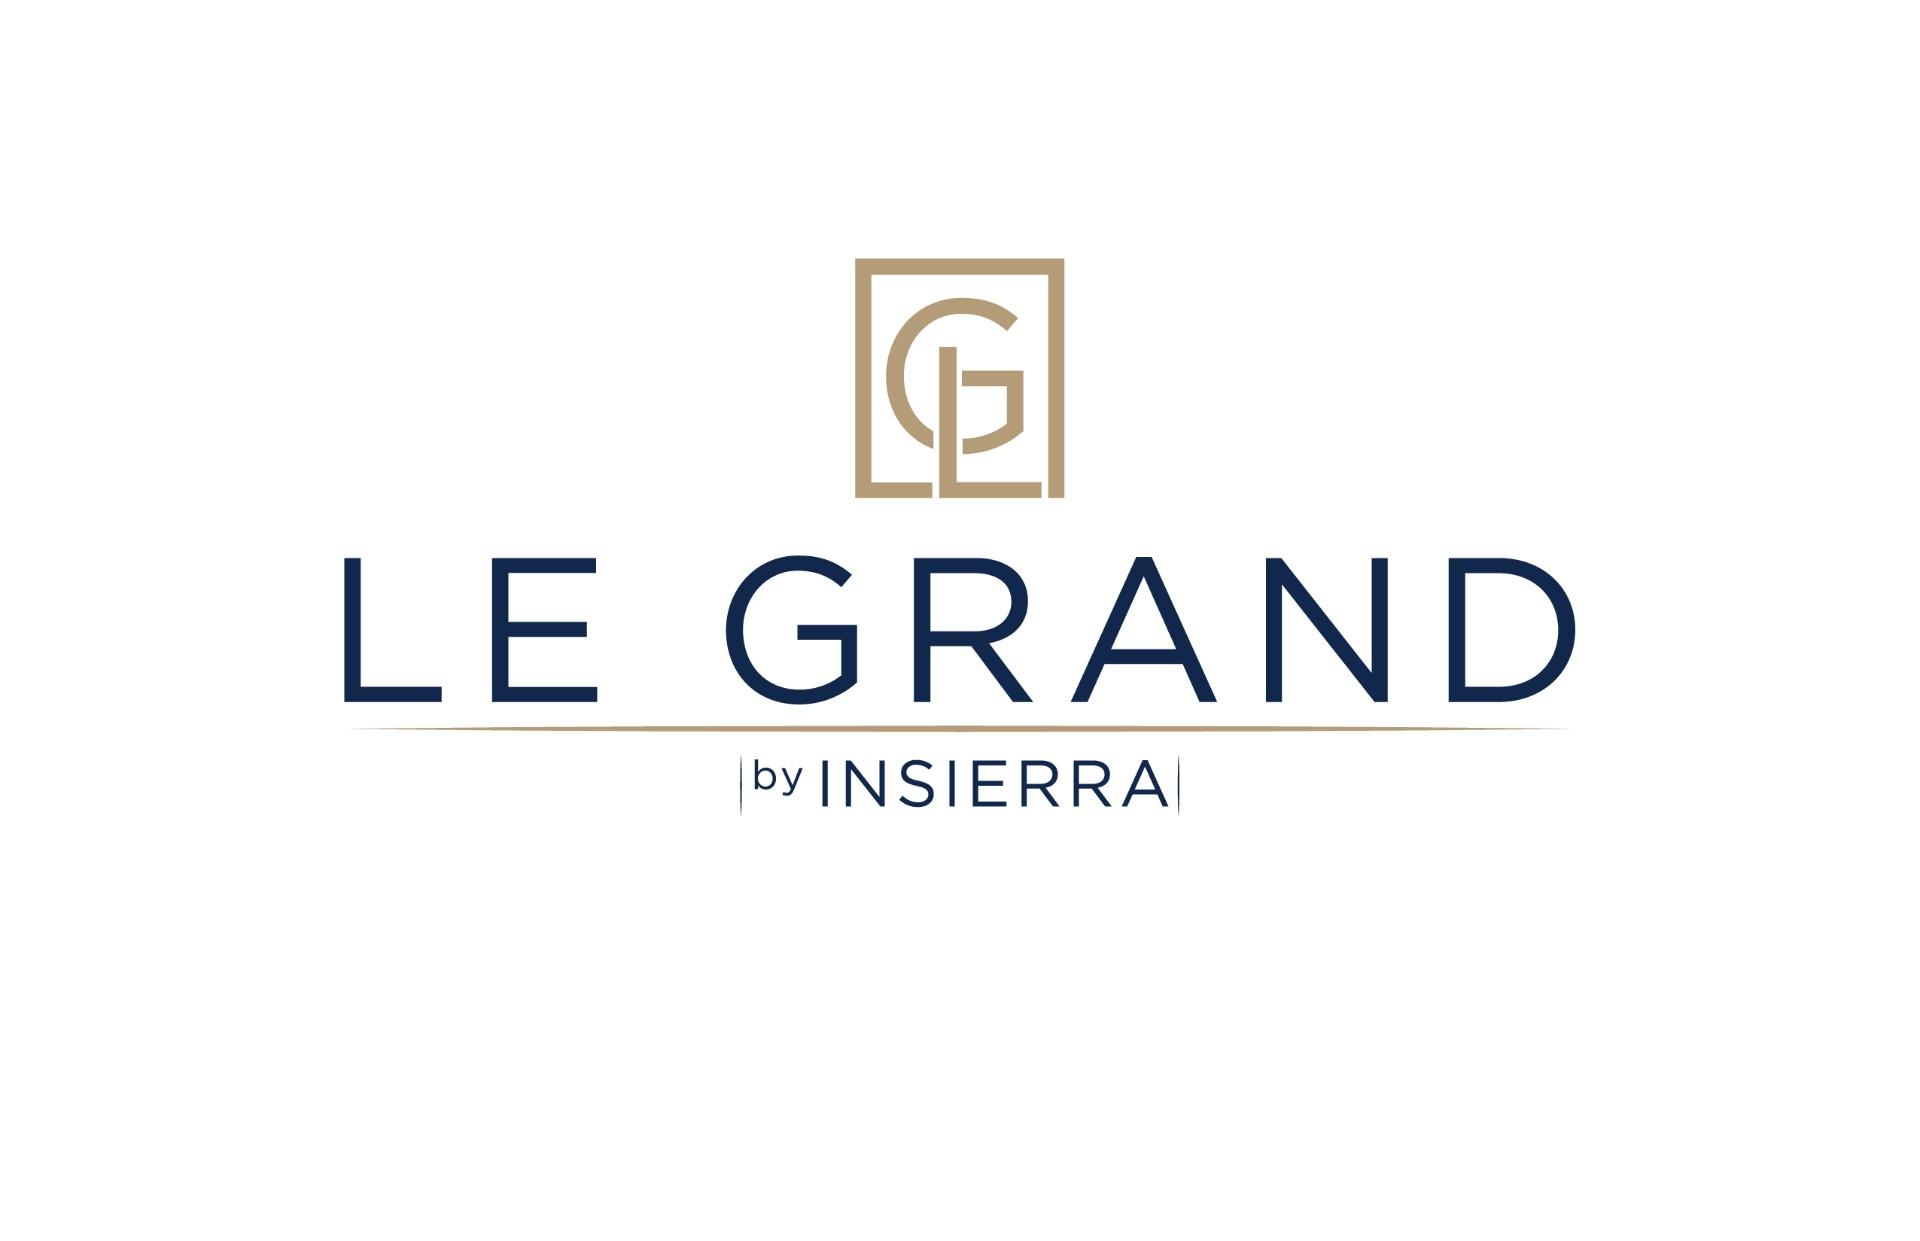 LE GRAND by INSIERRA